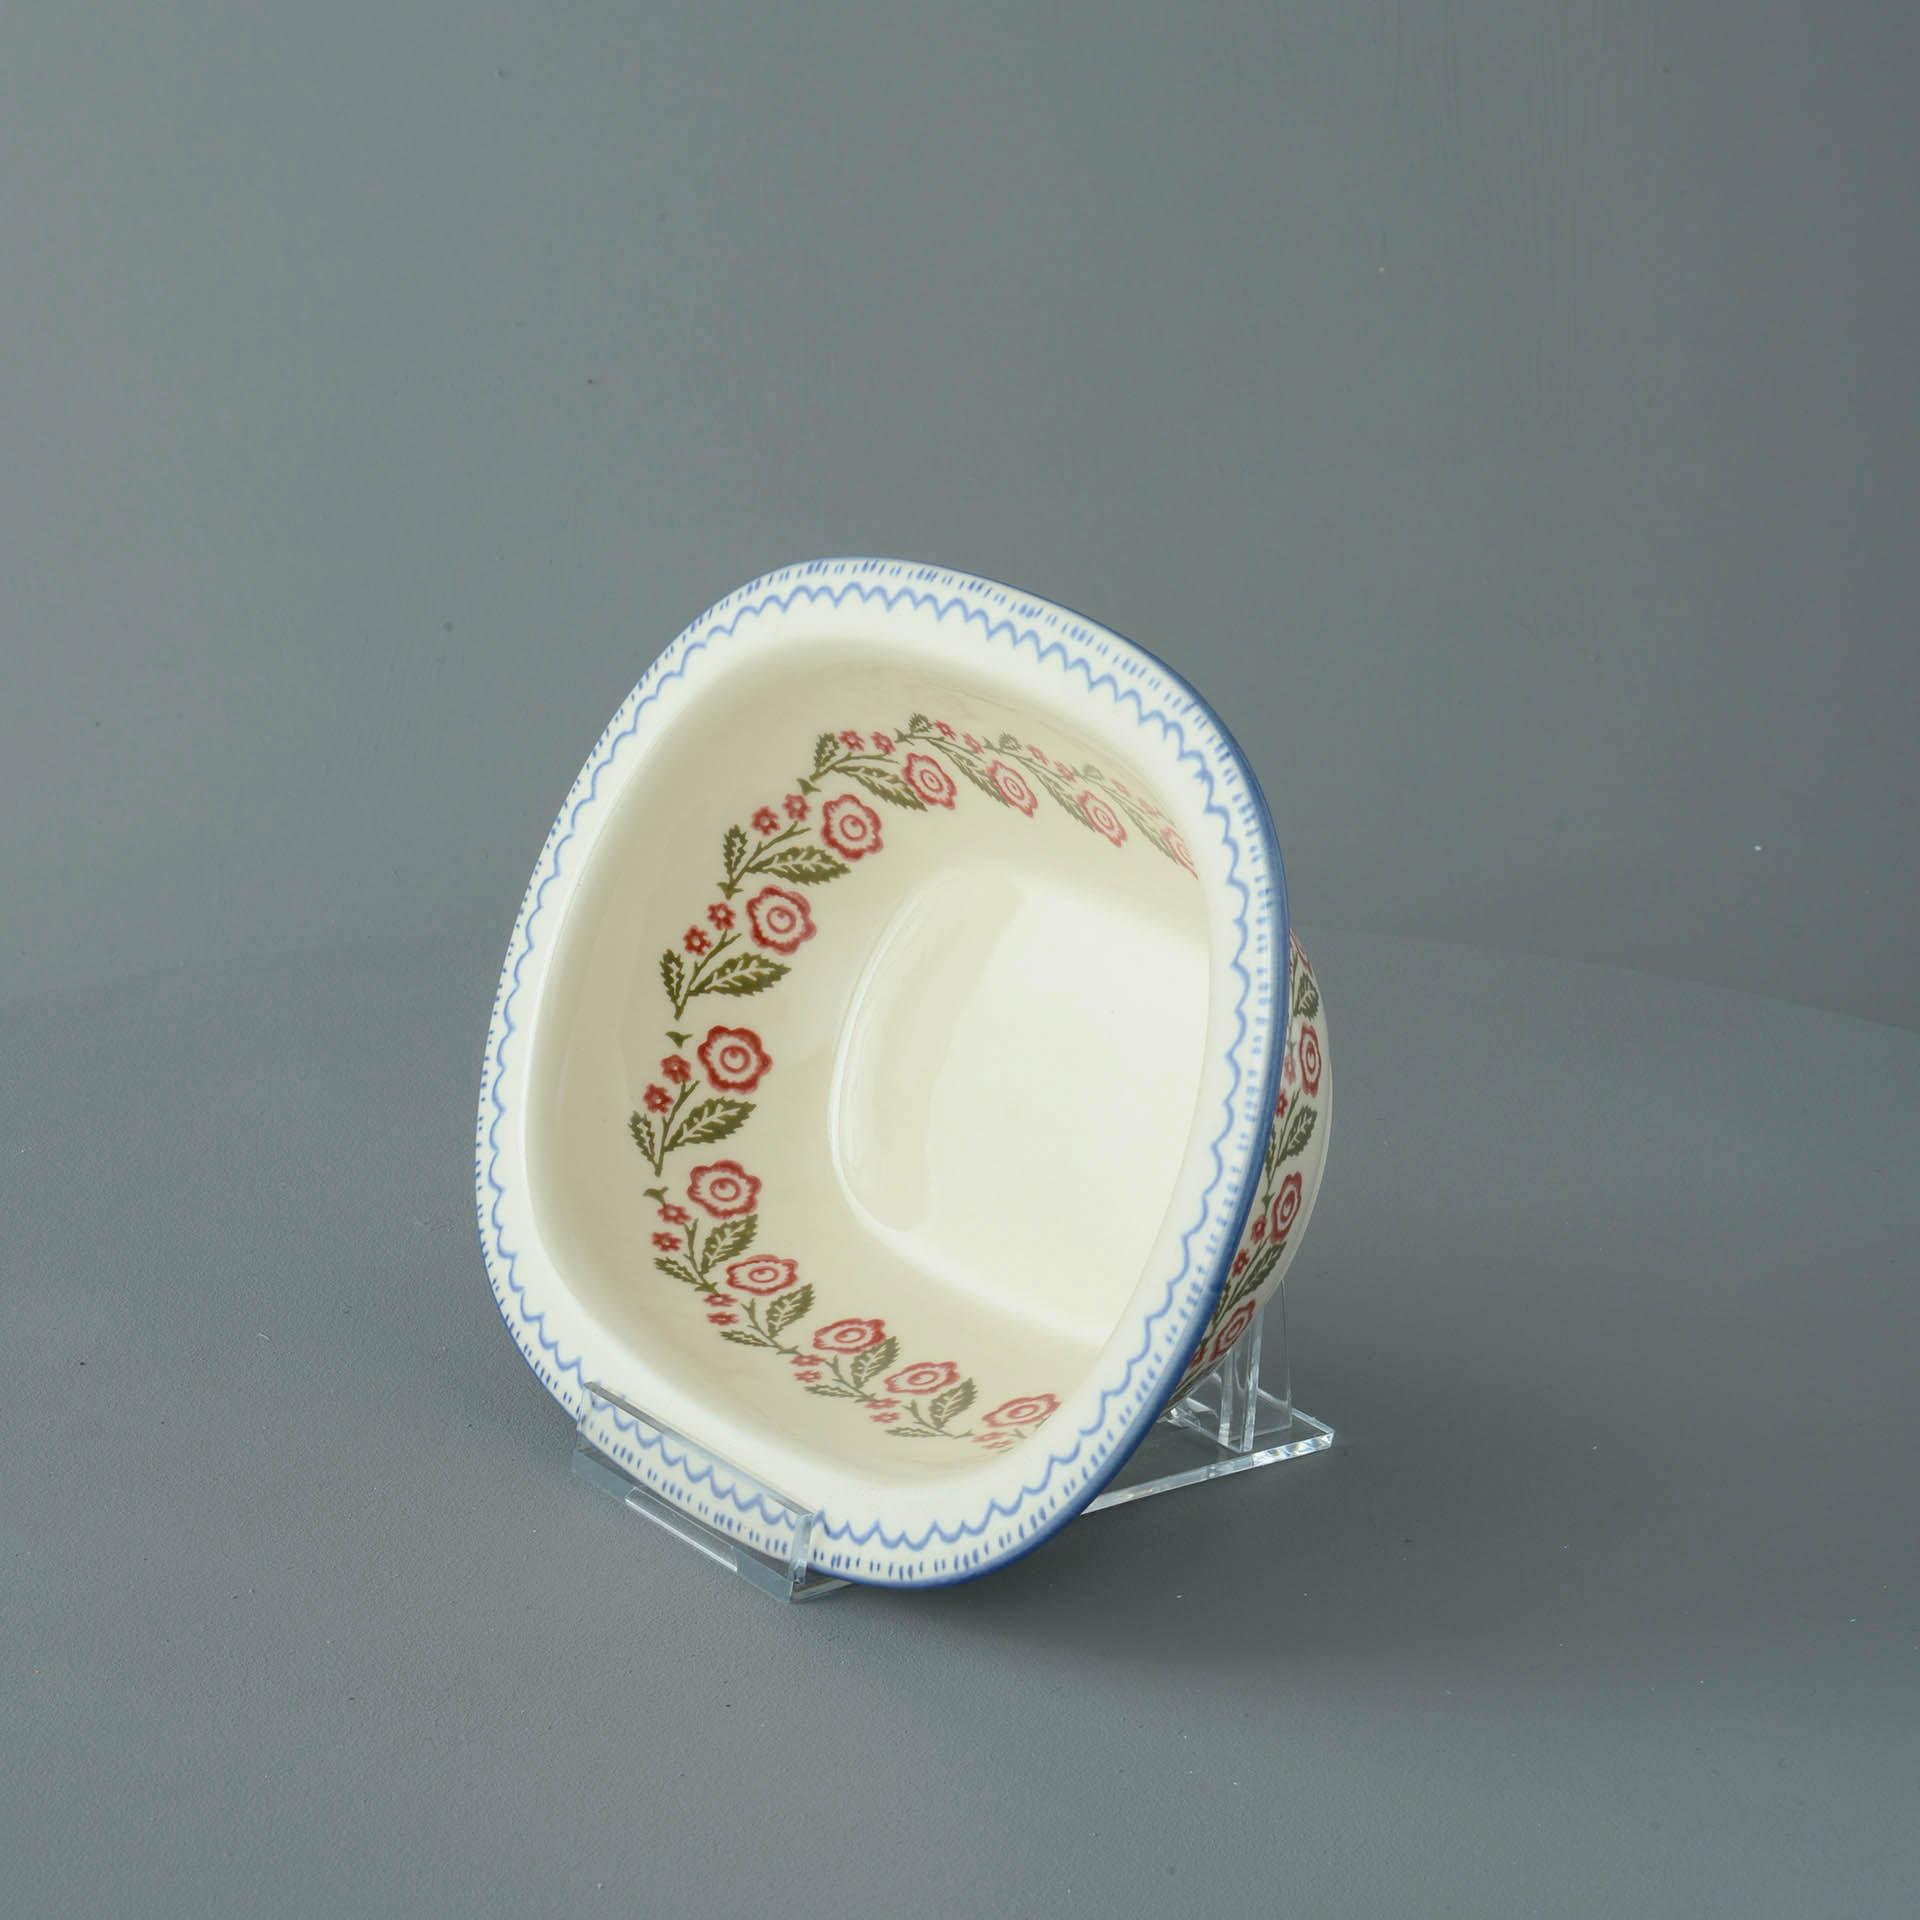 Creeping Briar Standard Pie Dish 23.5 x 18.5 x 6.5cm